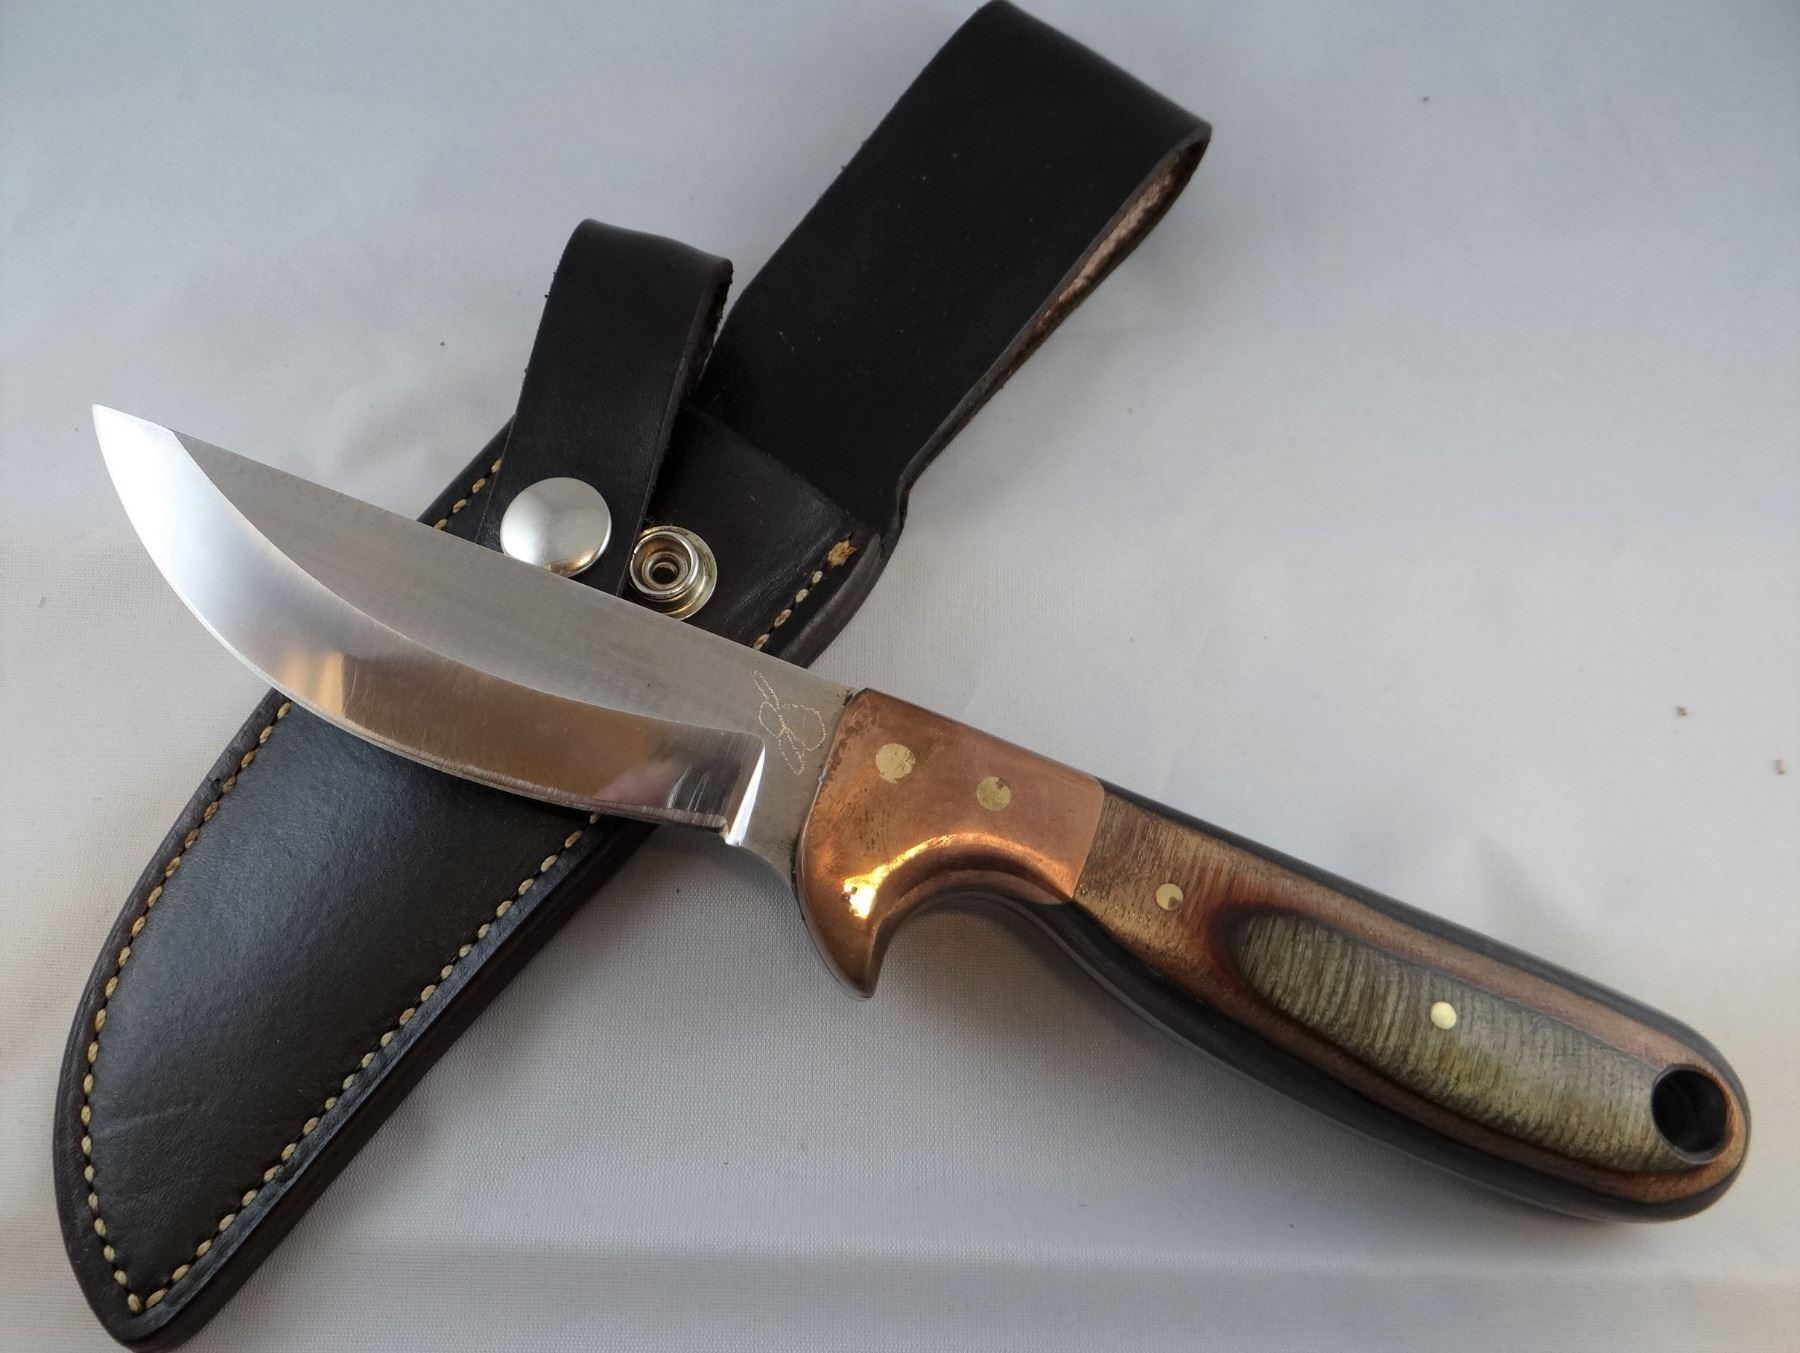 2 knives: Jim Brewer, 4